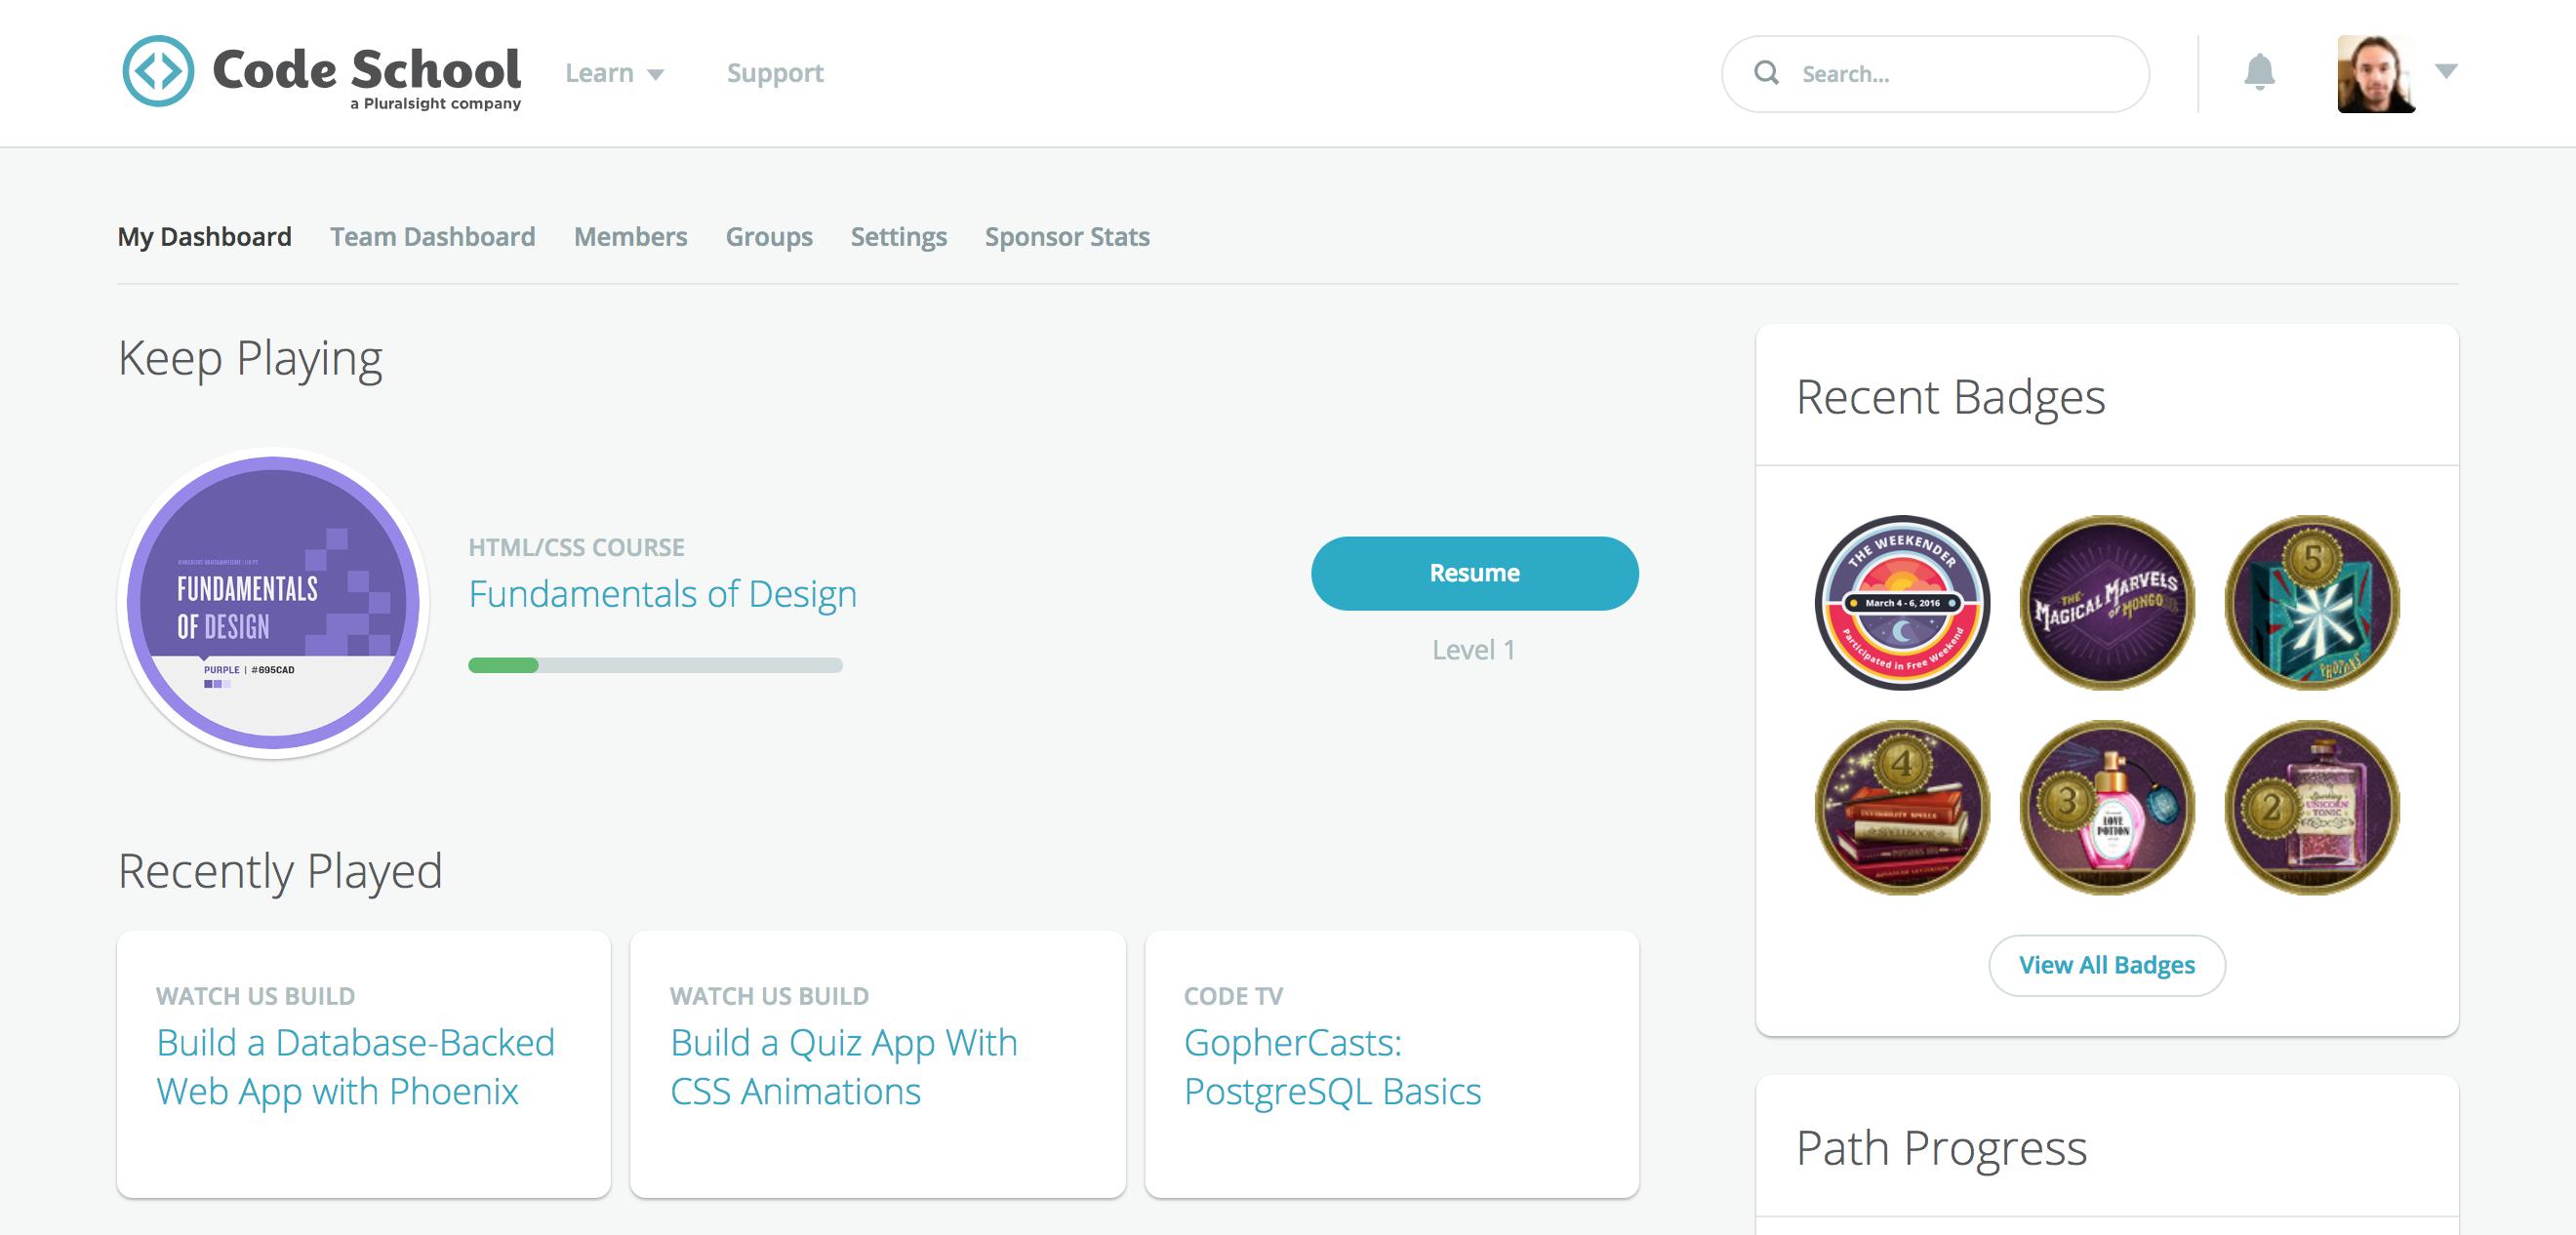 Screenshot of the Code School account dashboard